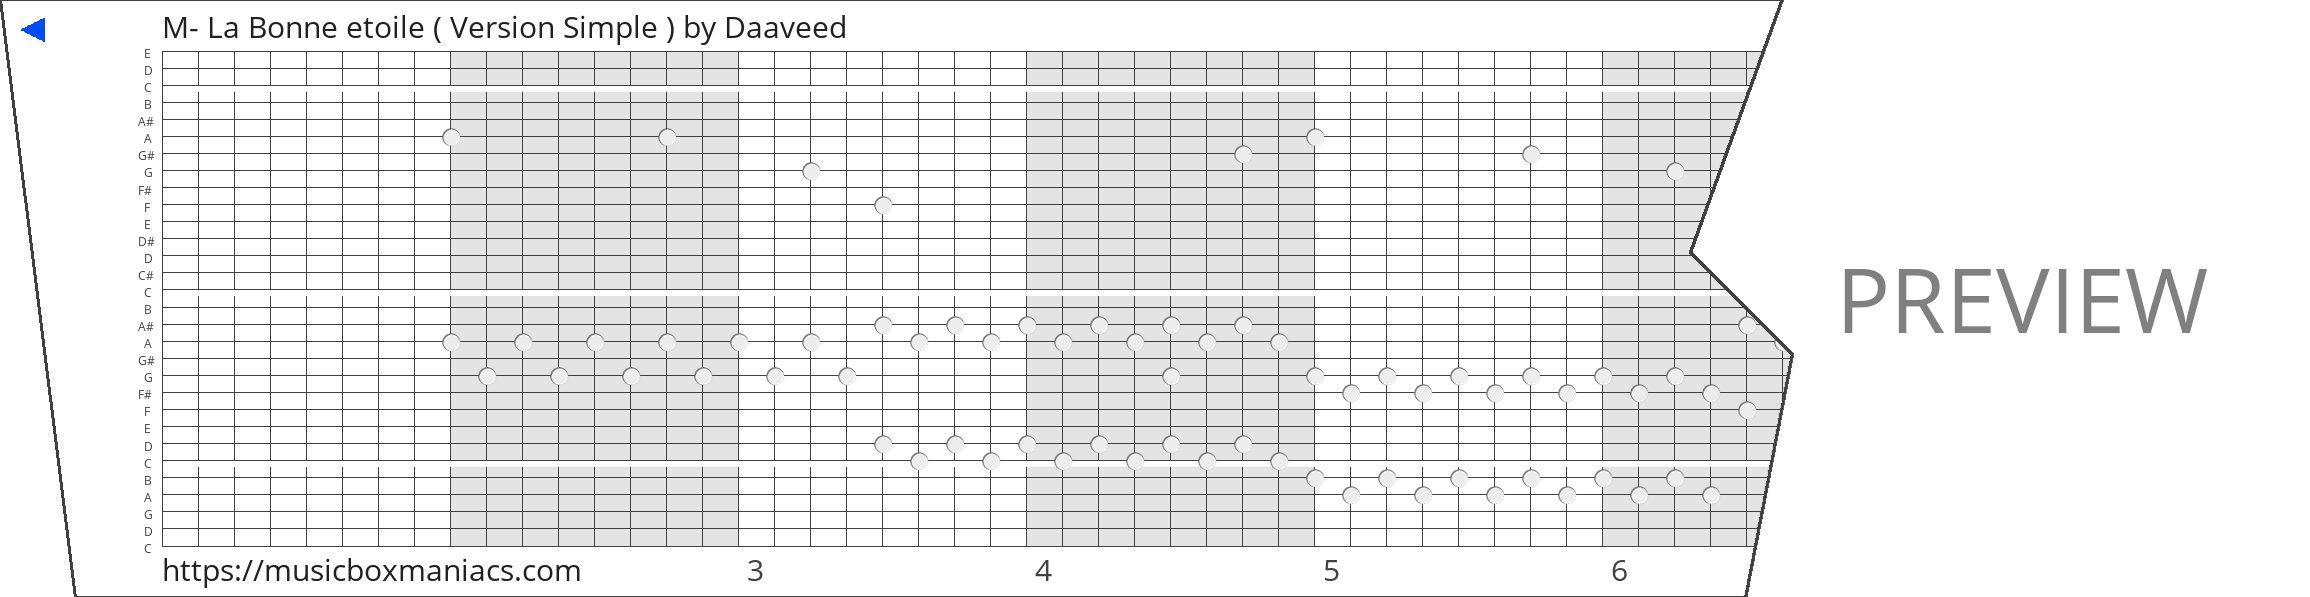 M- La Bonne etoile ( Version Simple ) 30 note music box paper strip